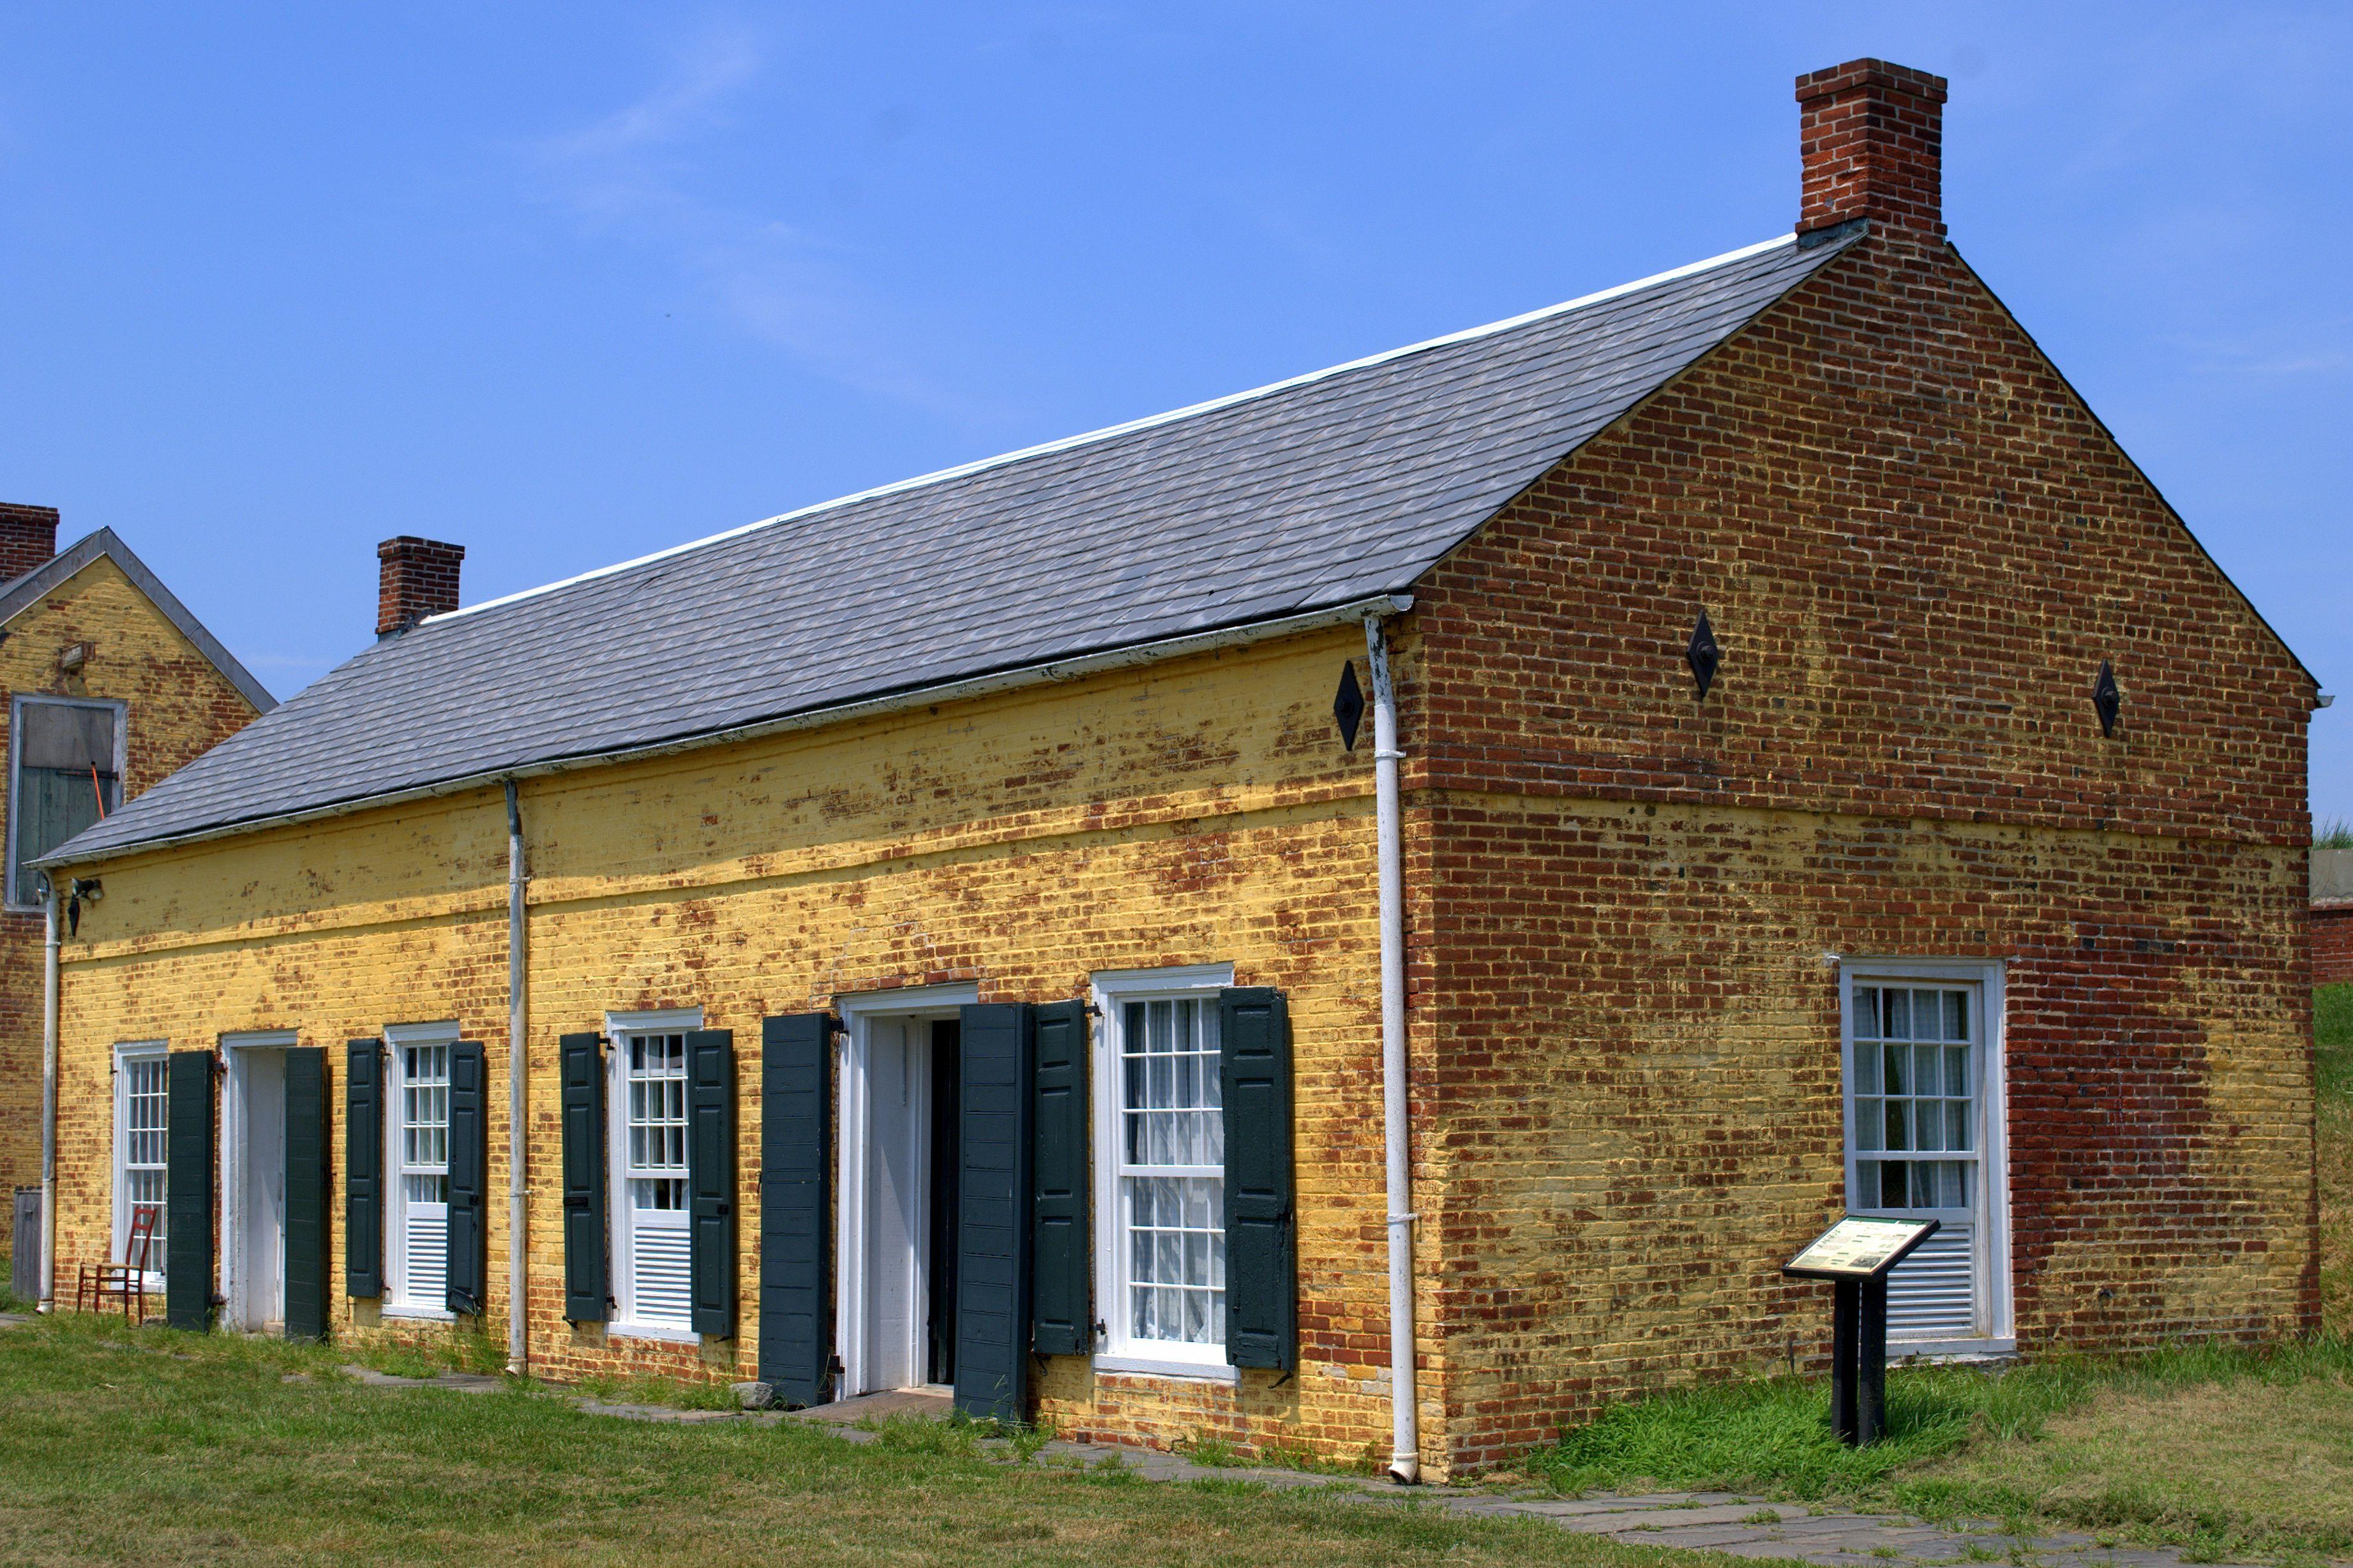 Fort Mifflin Quartermasters house in Pennsylvania.